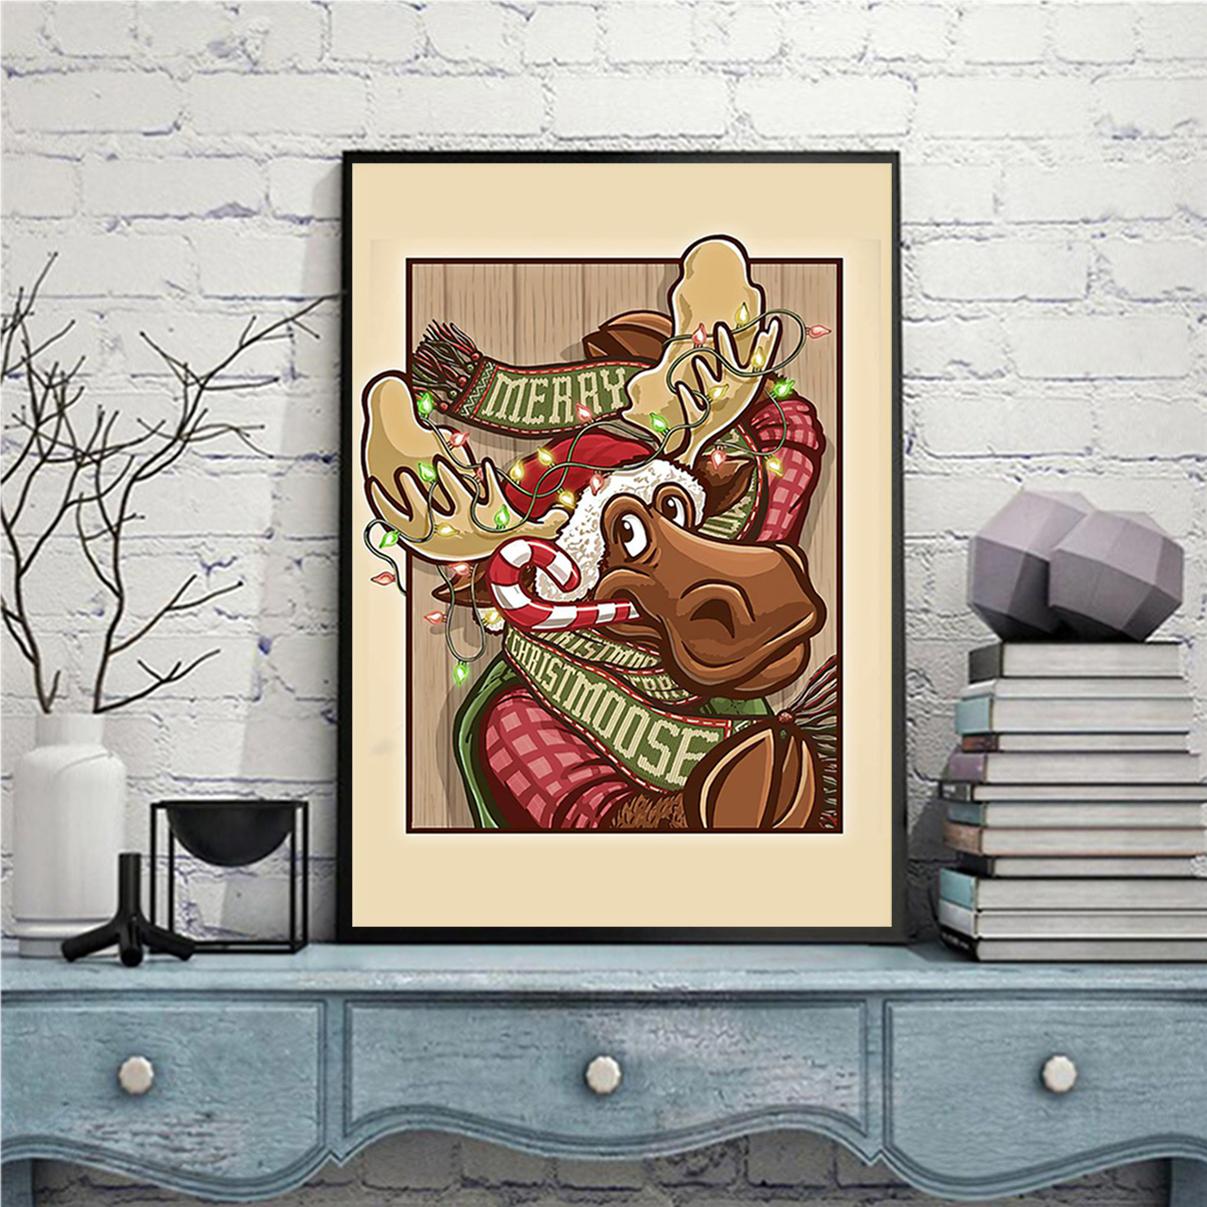 Moose merry christmoose christmas poster A3